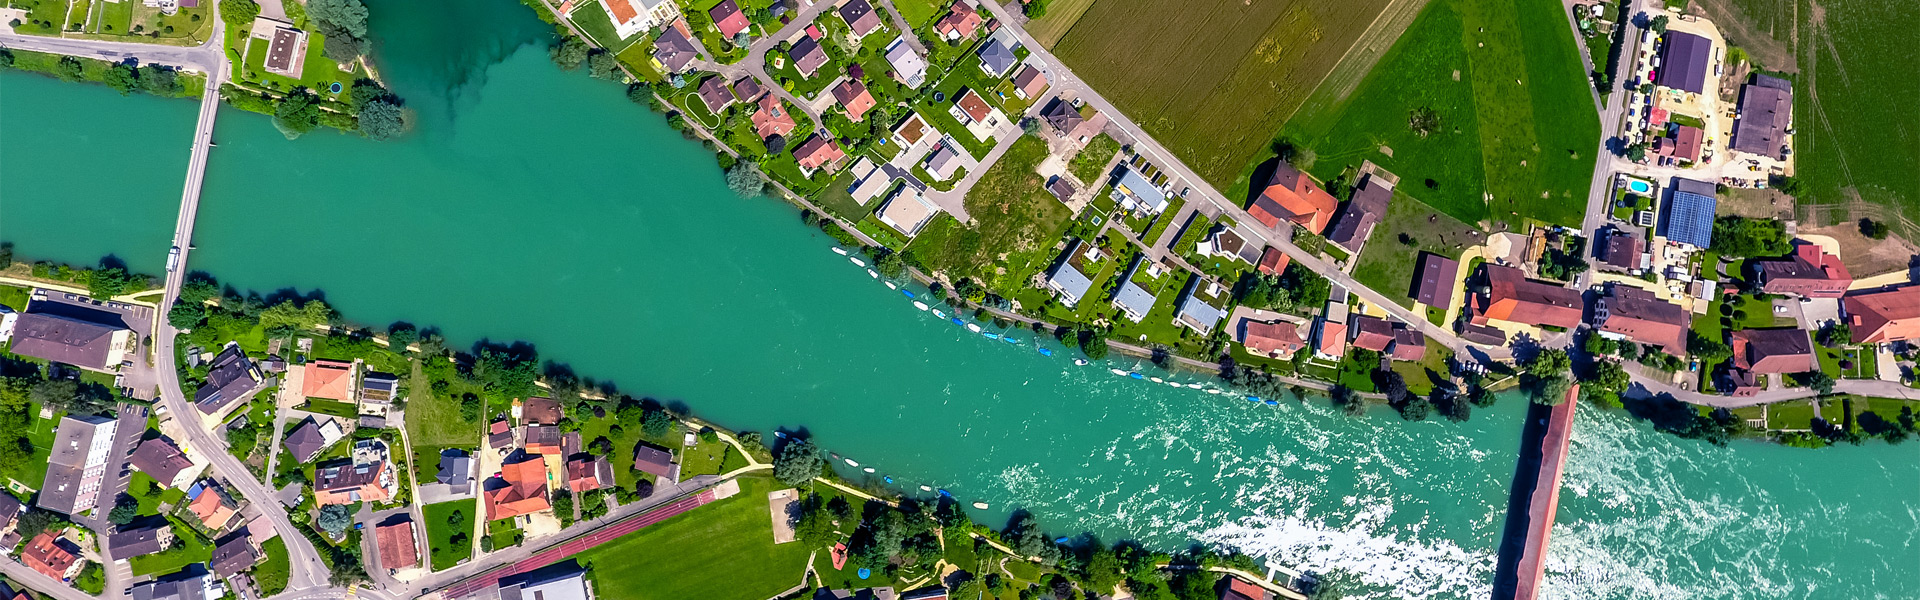 Bootsprüfung Aare bei Solothurn